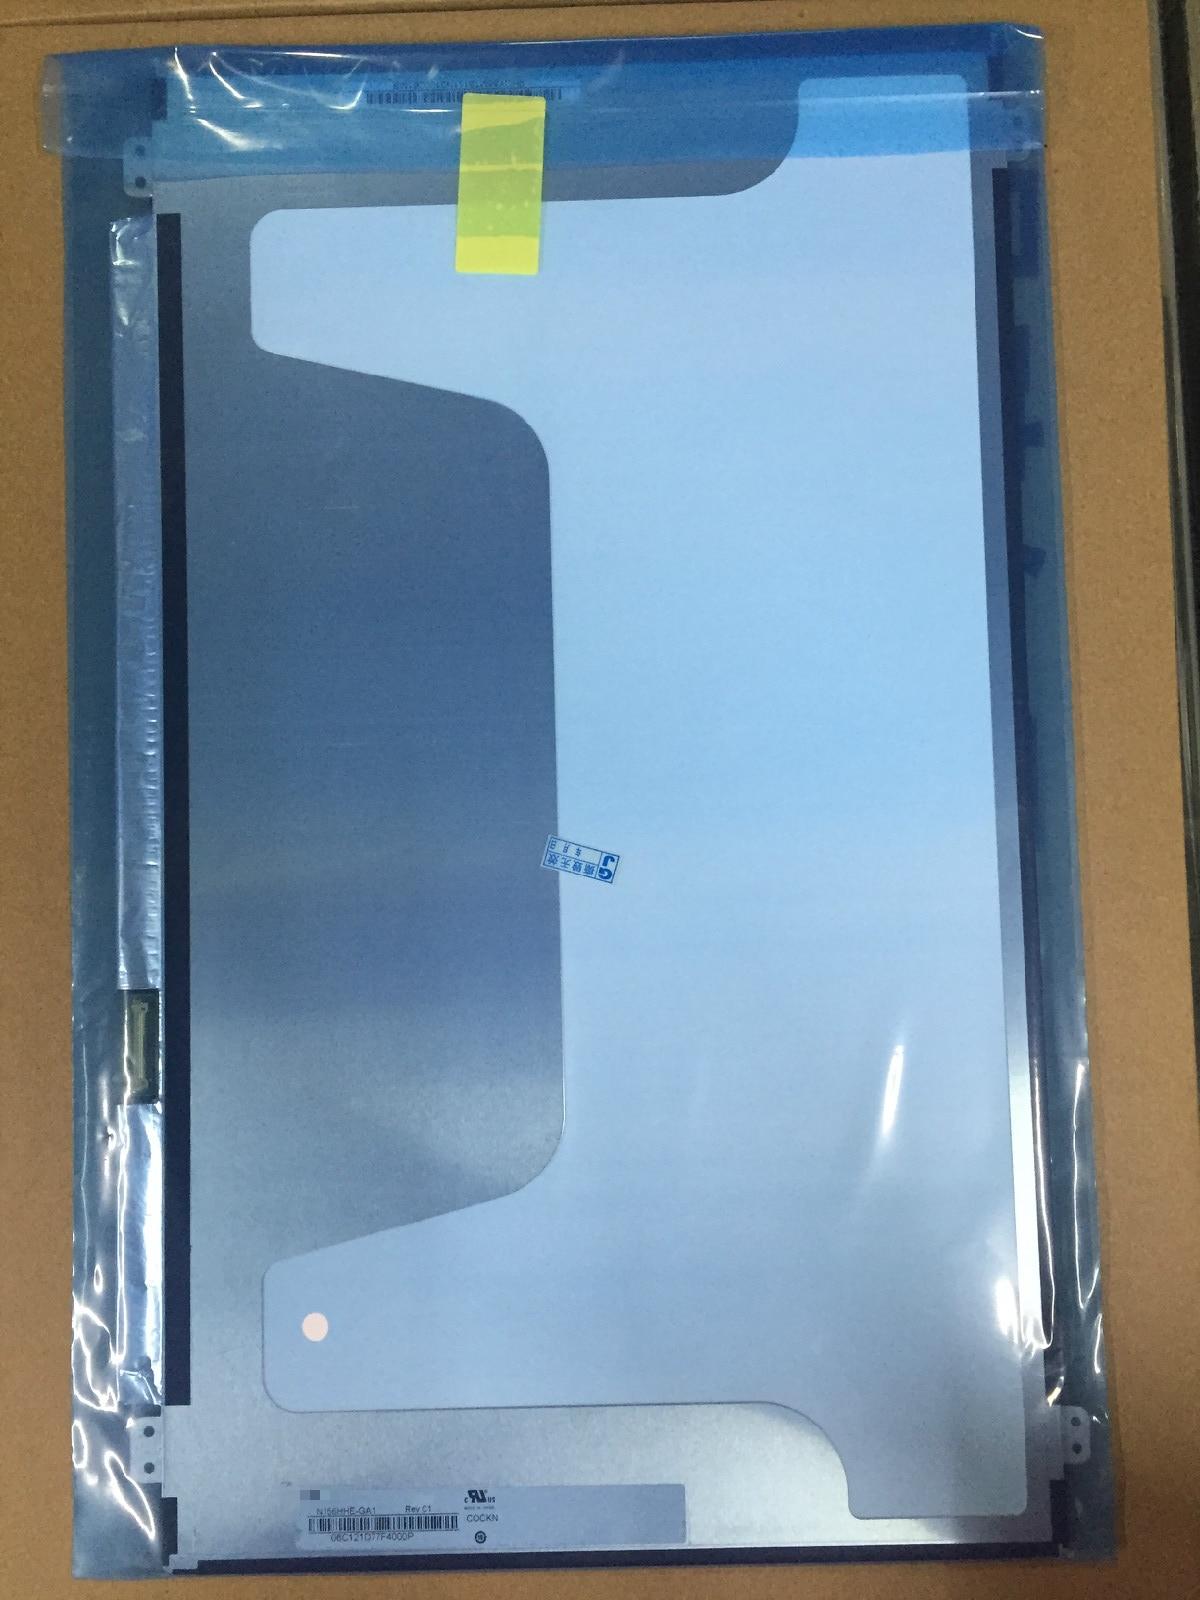 "15.6"" 3D LCD Screen Display N156HHE-GA1 REV.C1 FHD edp 30pin 1920X1080 120HZ N156HHE GA1"